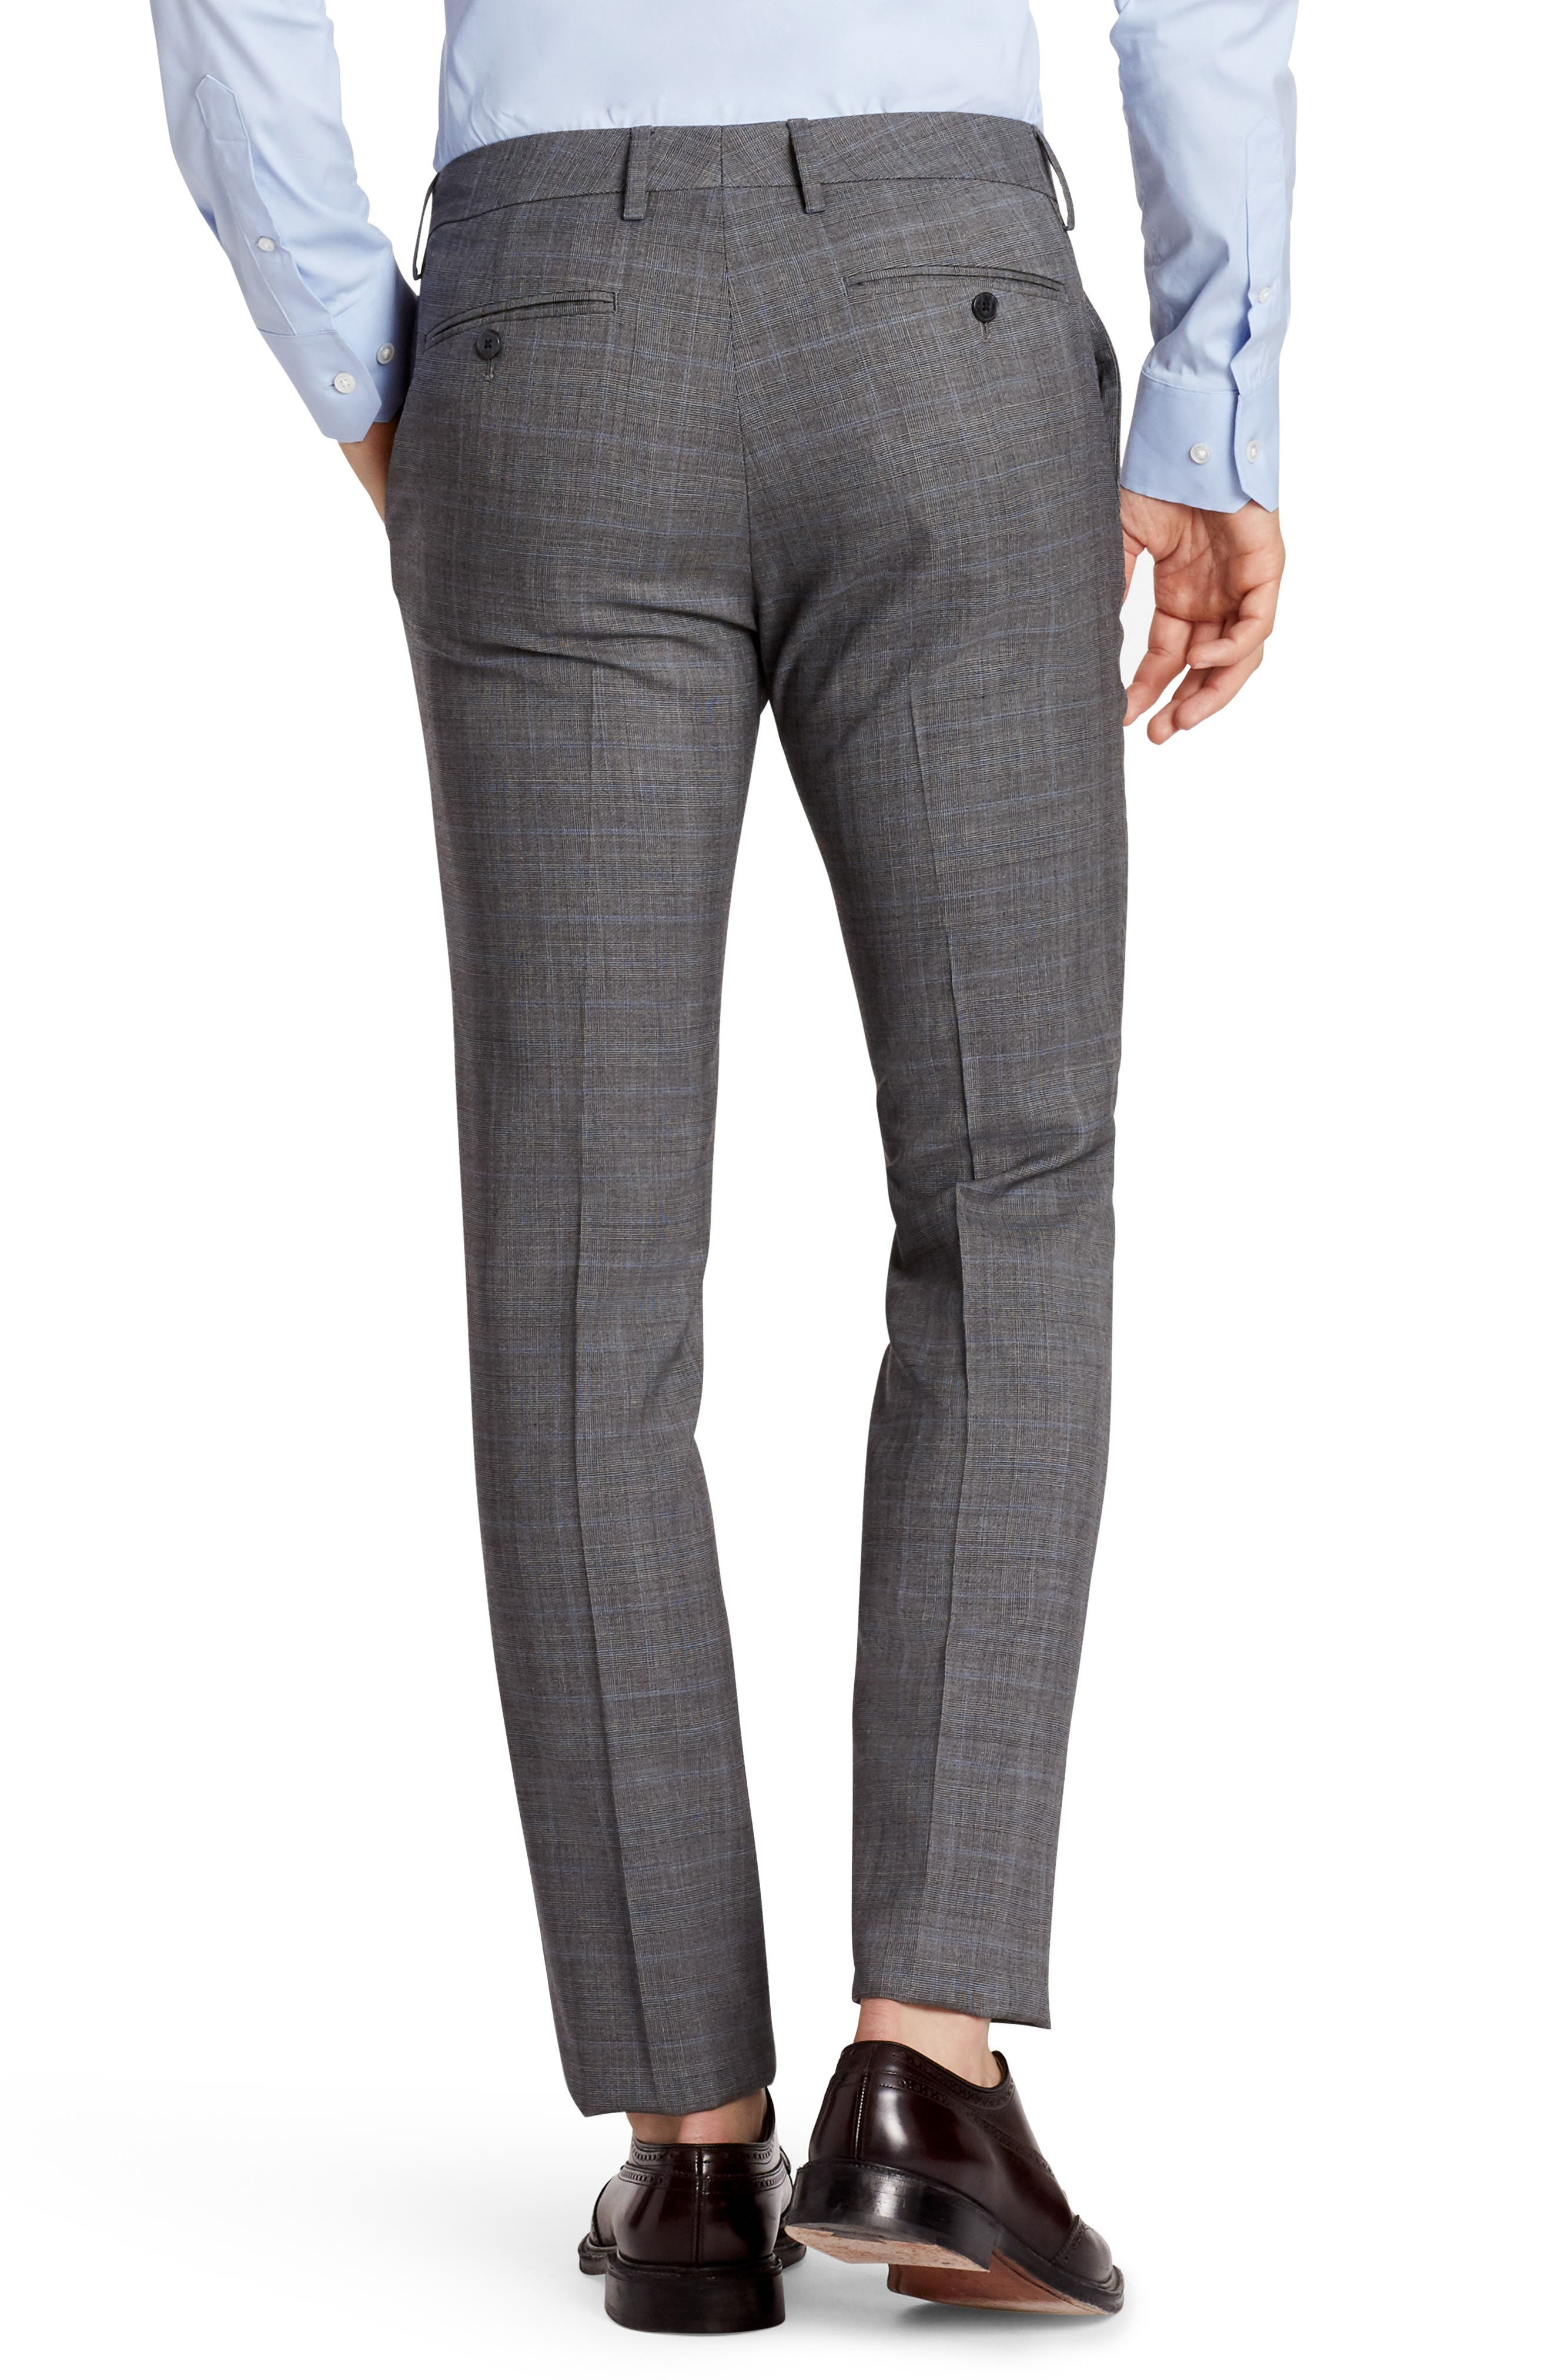 BONOBOS, Jetsetter Flat Front Plaid Stretch Wool Trousers, Alternate thumbnail 2, color, 020